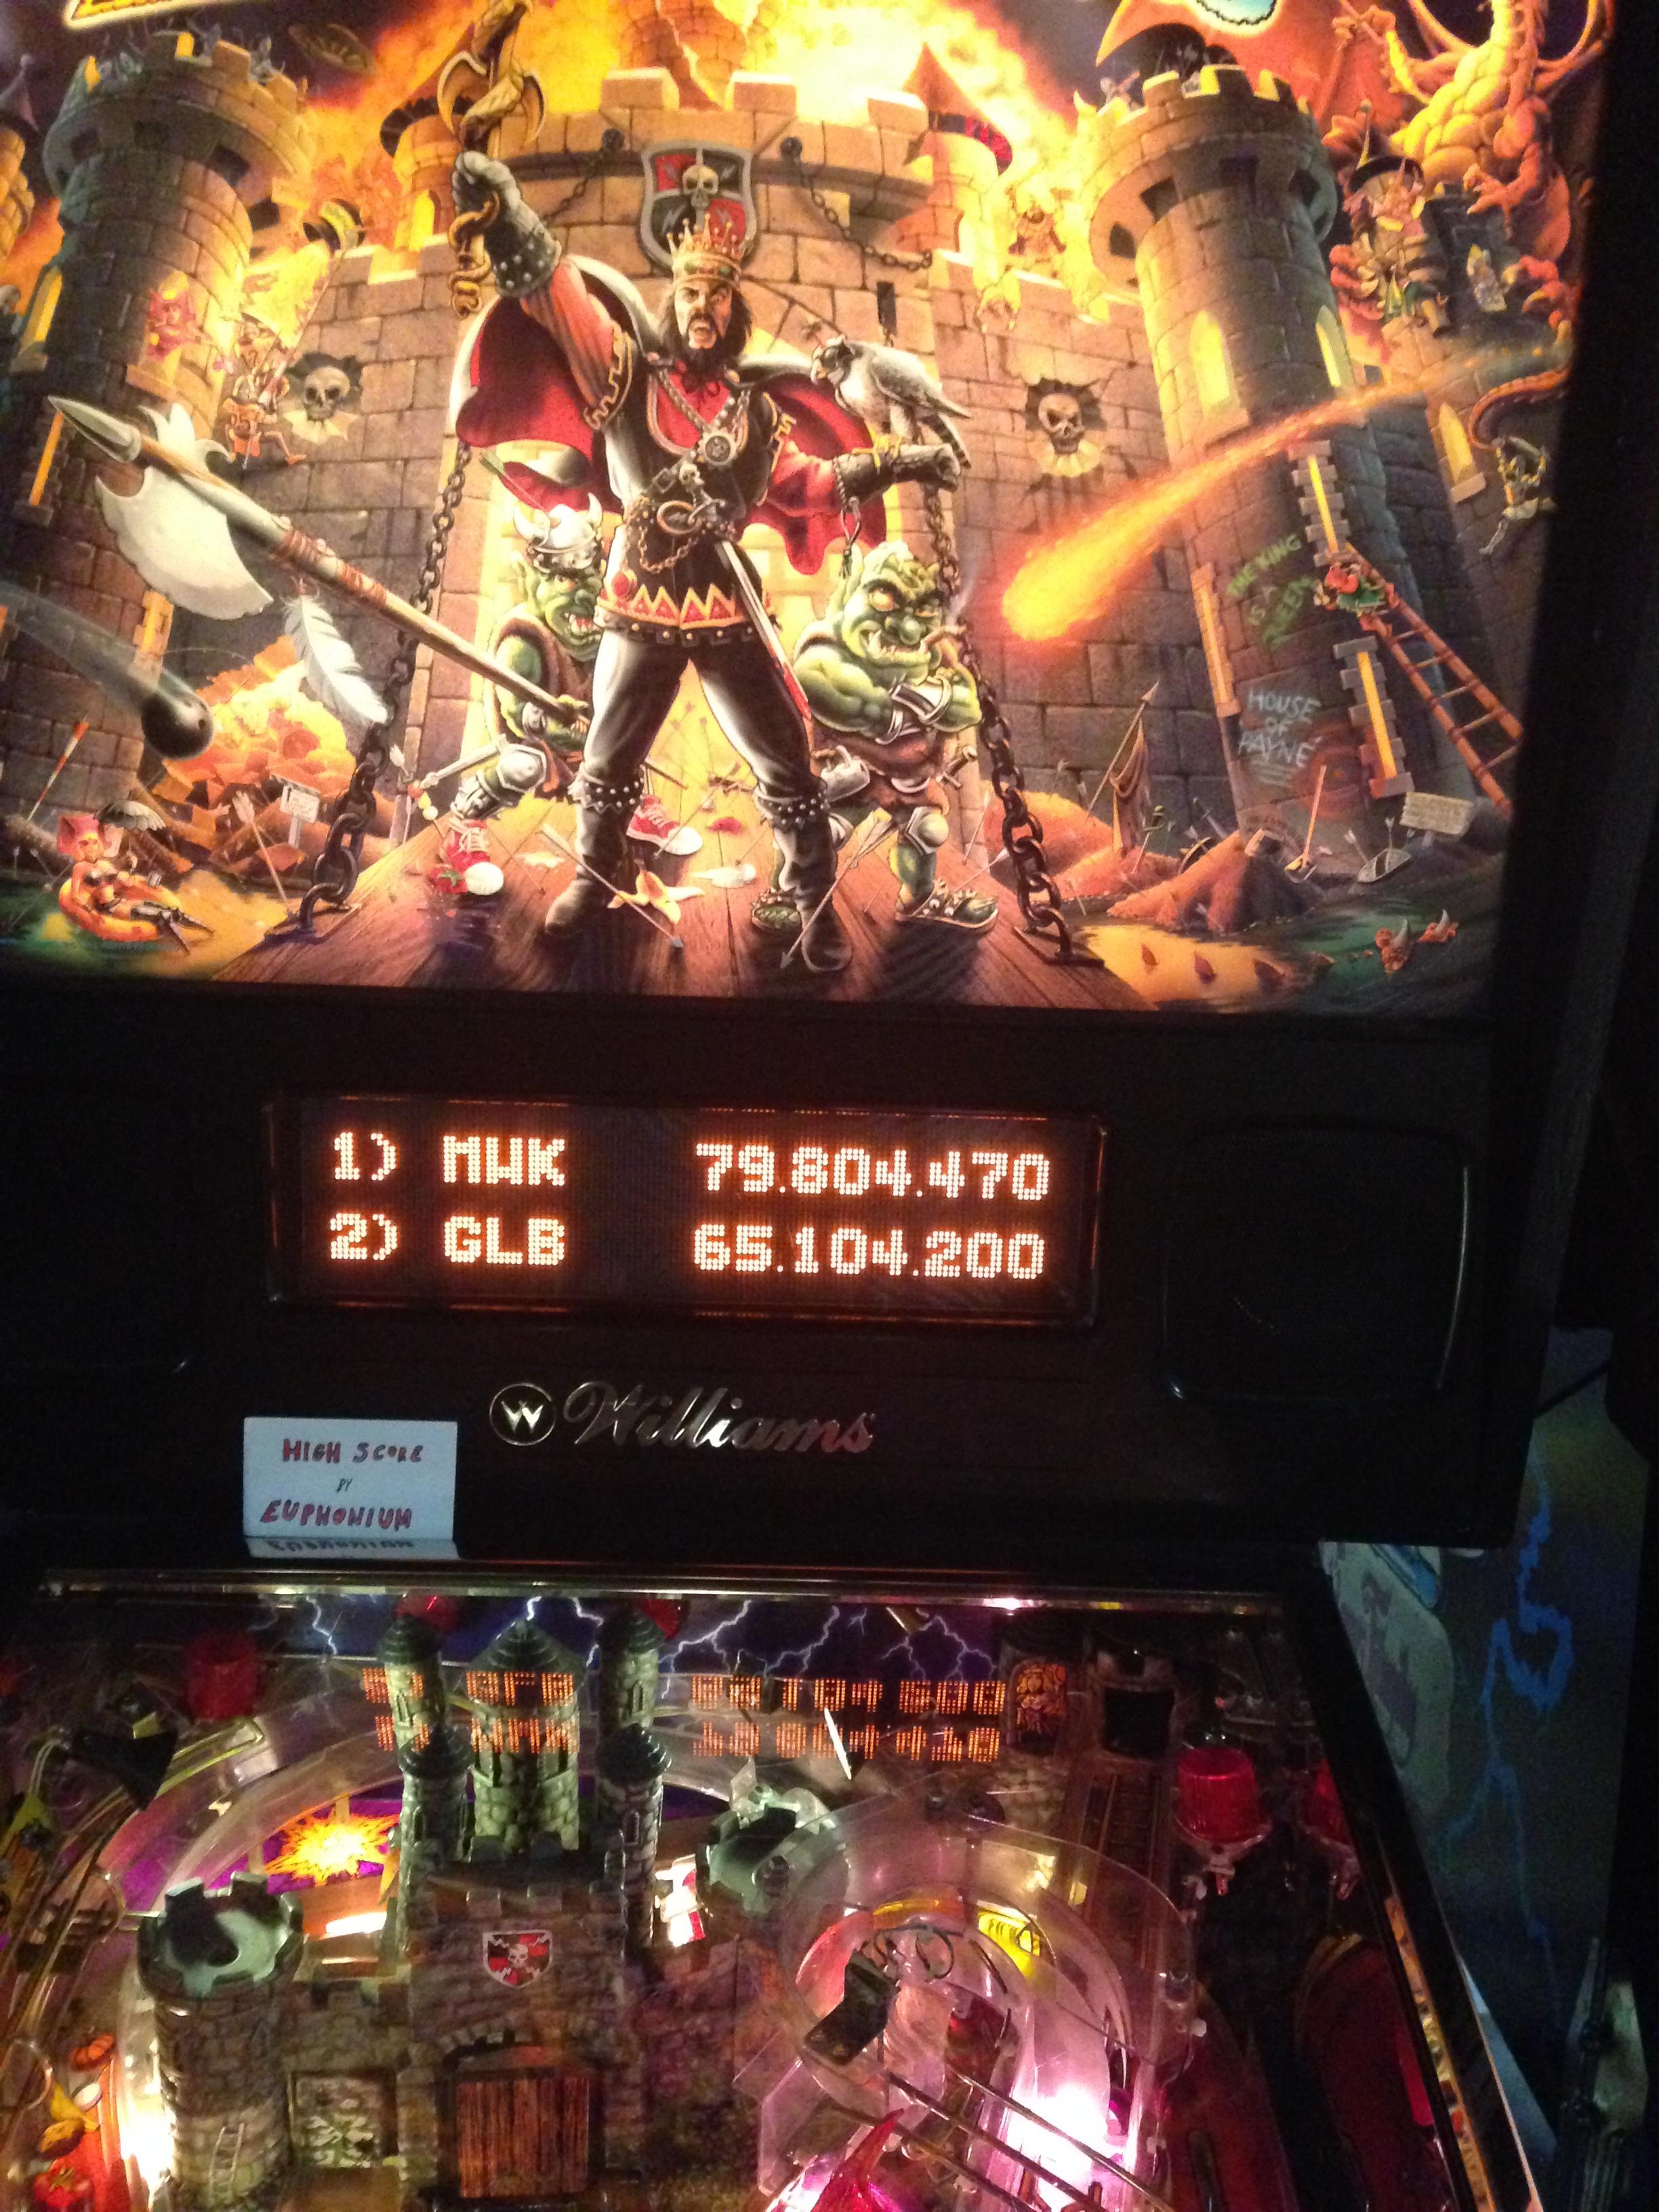 euphonium: Medieval Madness (Pinball: 3 Balls) 79,804,470 points on 2017-02-22 23:46:29